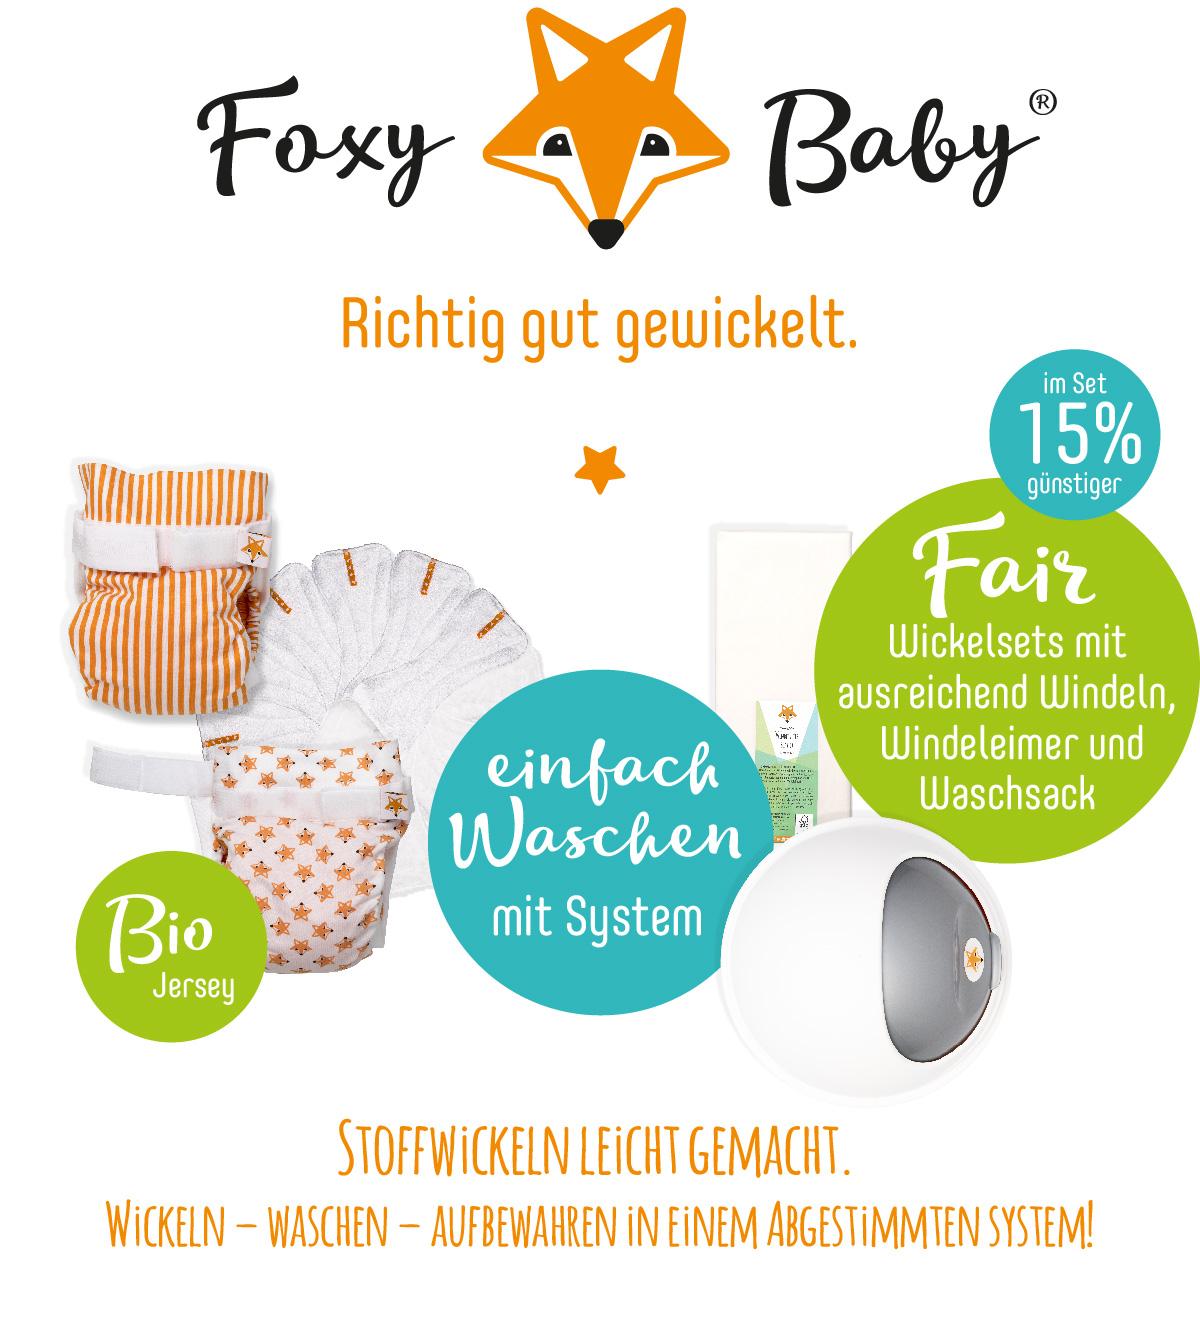 foxy baby vorteile stoffwindeln wickelsystem AI3 AI2